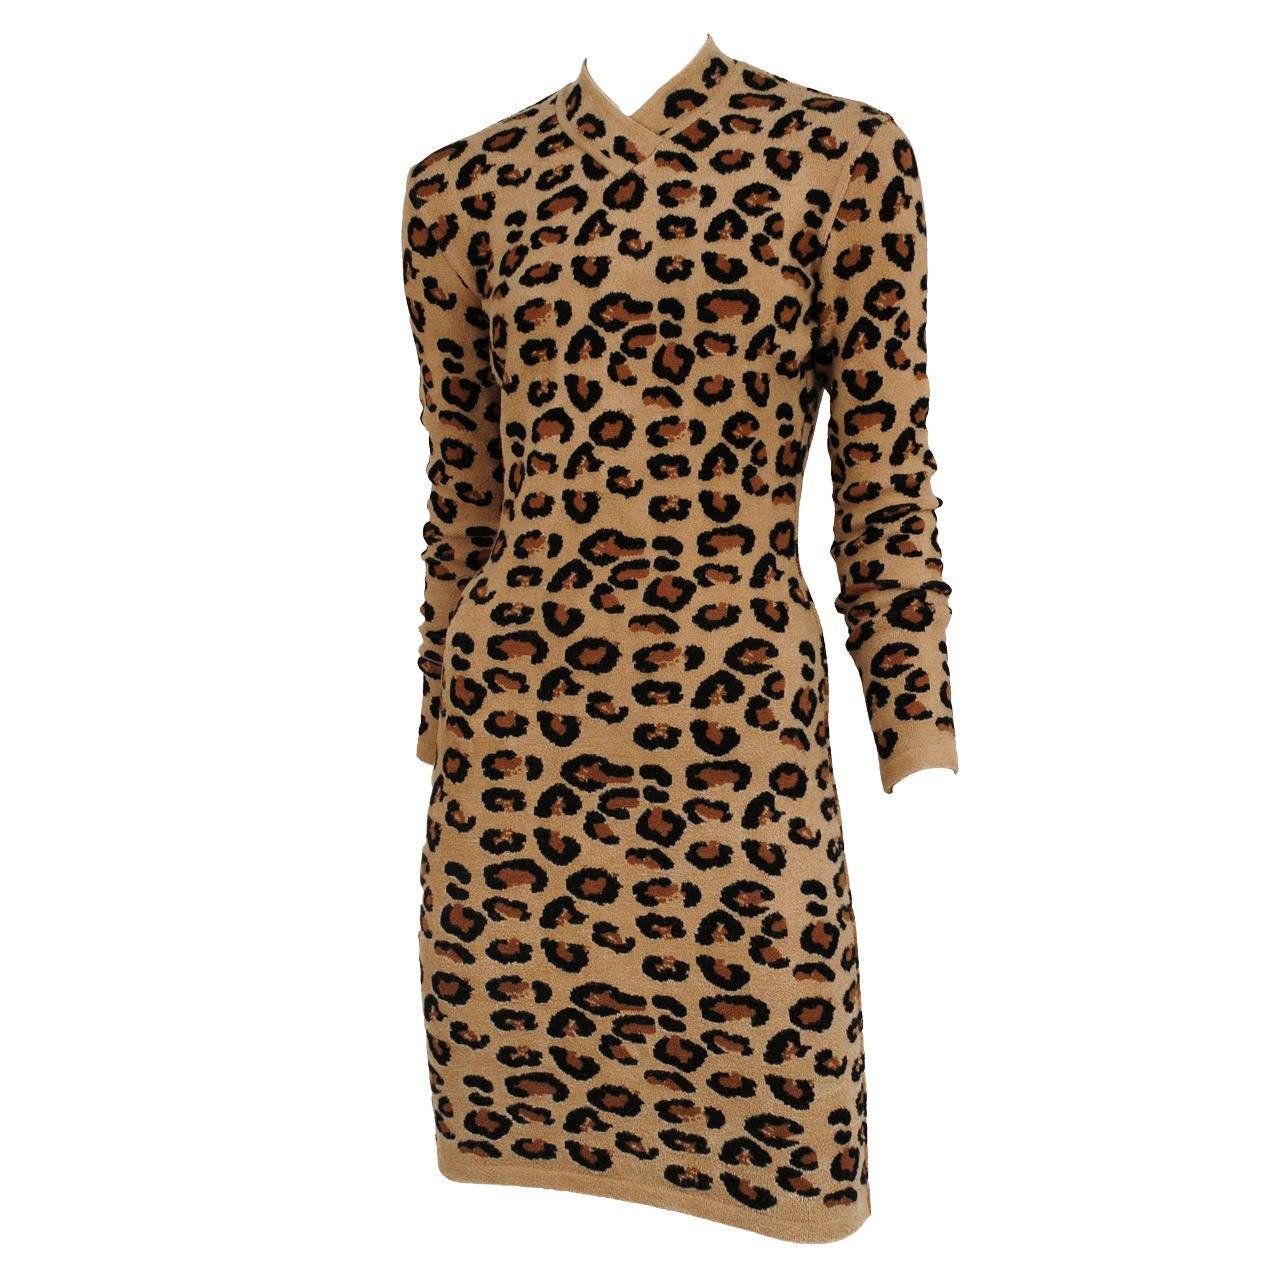 Azzedine Alaïa leopard mini-dress, 1990s